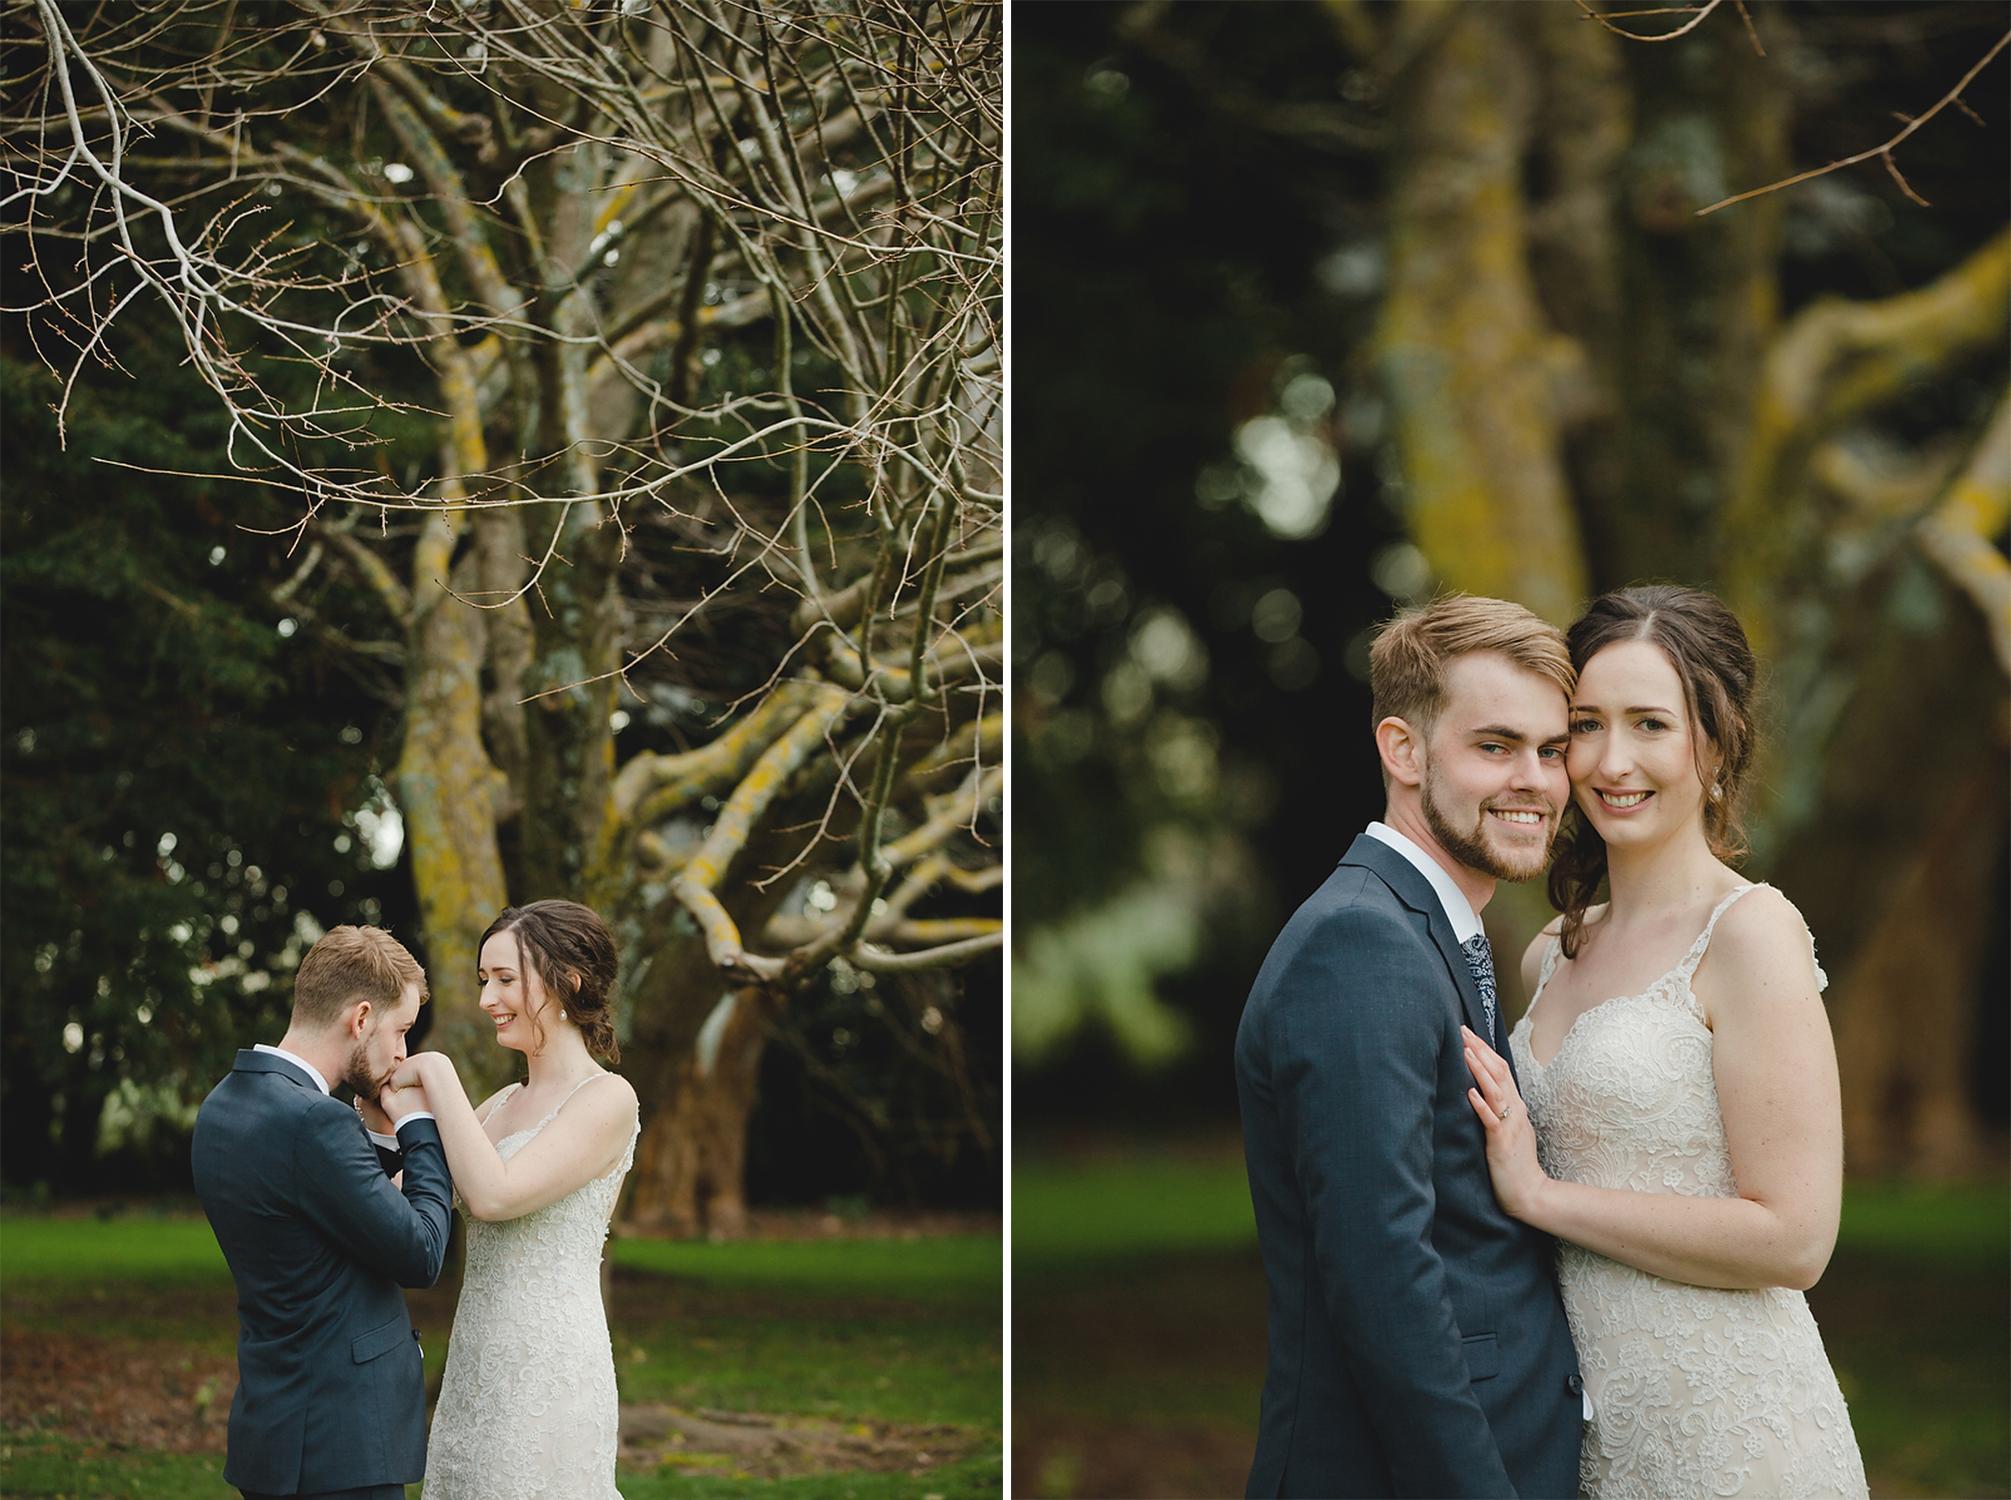 wellington wedding photography NZ - 0165.JPG